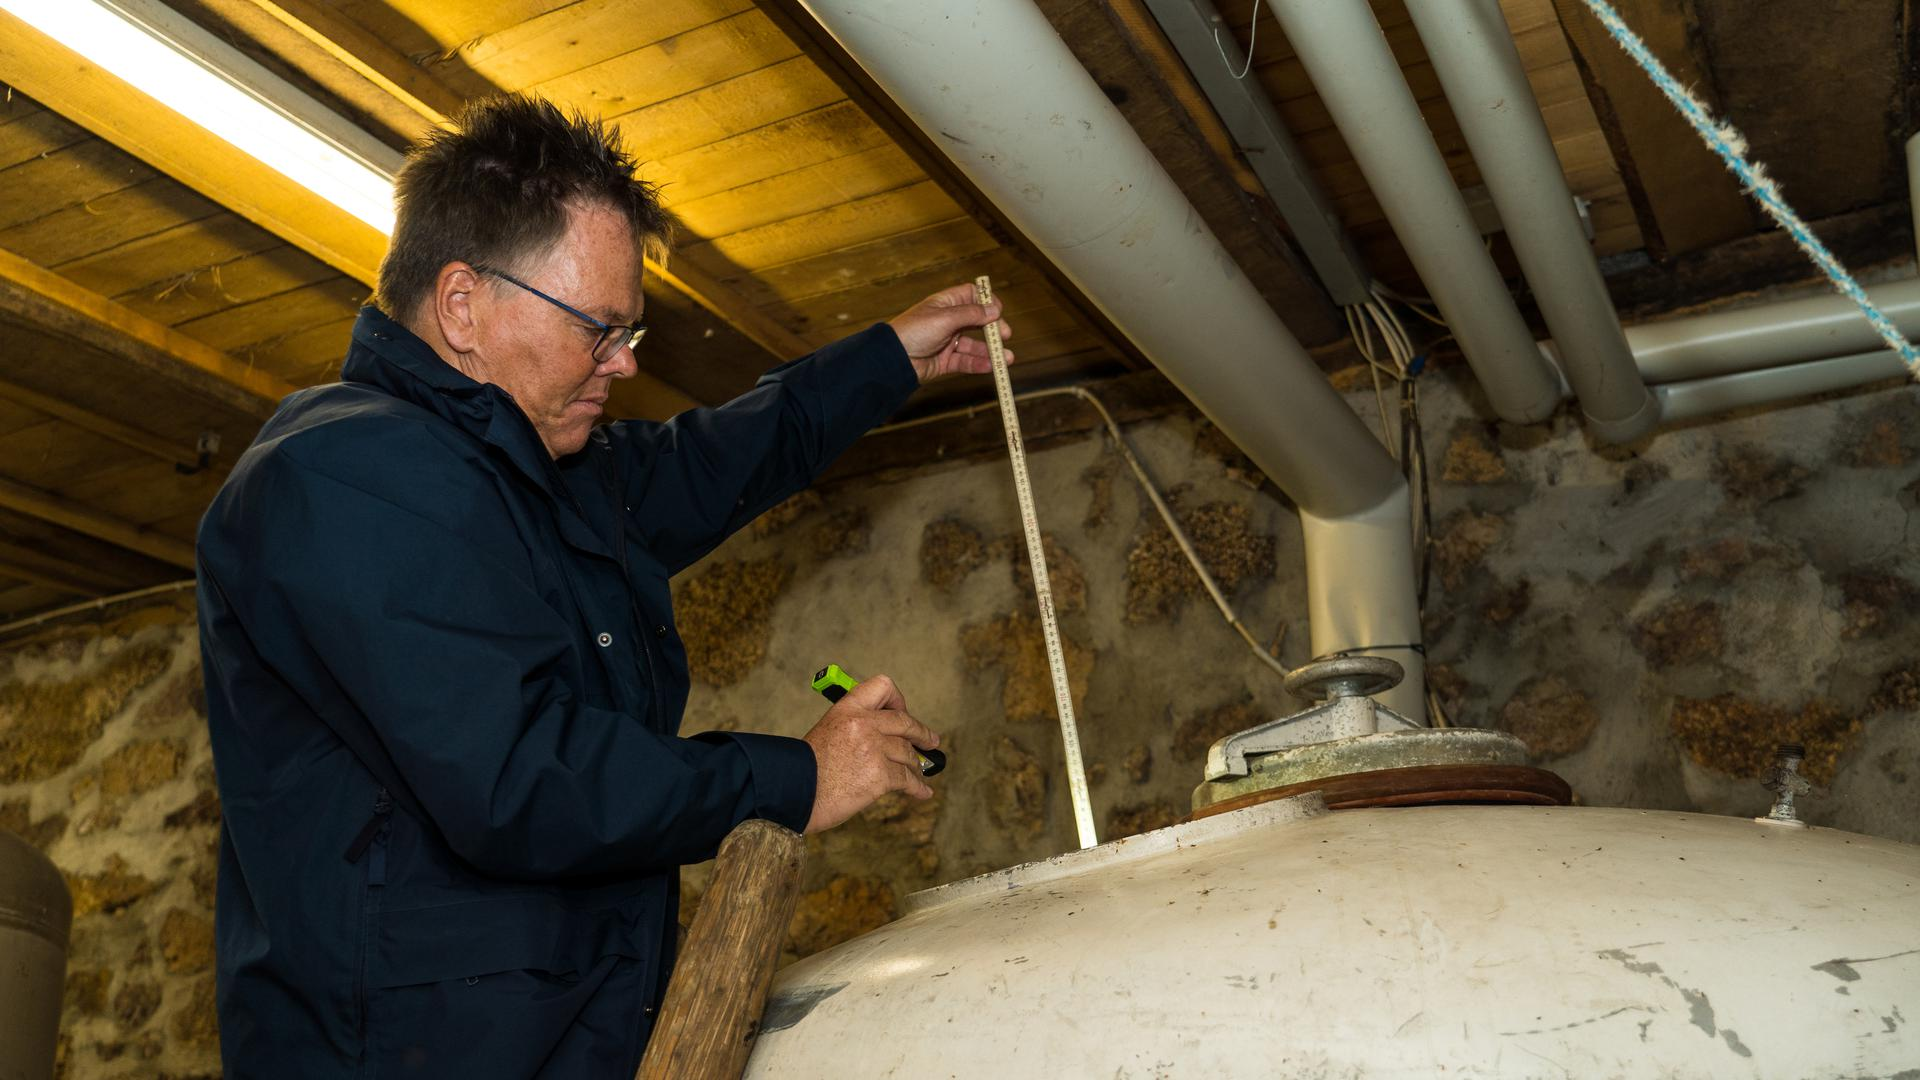 Zollamtsinspekteur Jan Frank misst mit einem Zollstock den Inhalt der Maischefässer im Keller des Oberkircher Schnapsbrenners Josef Brandstetter.